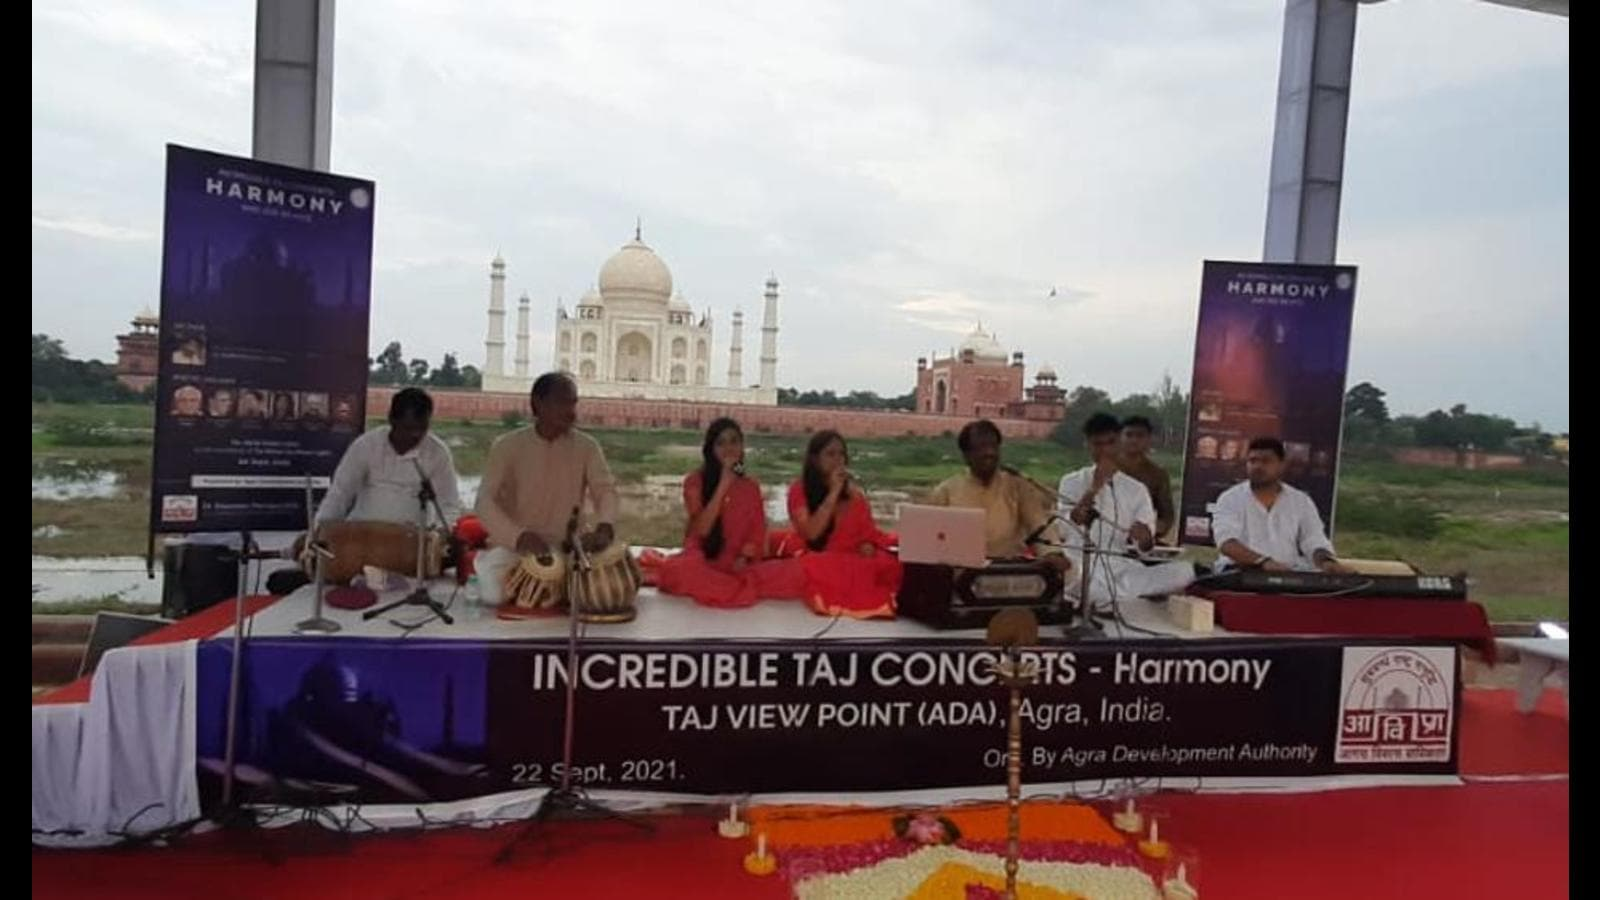 Concert near Taj Mahal sparks controversy